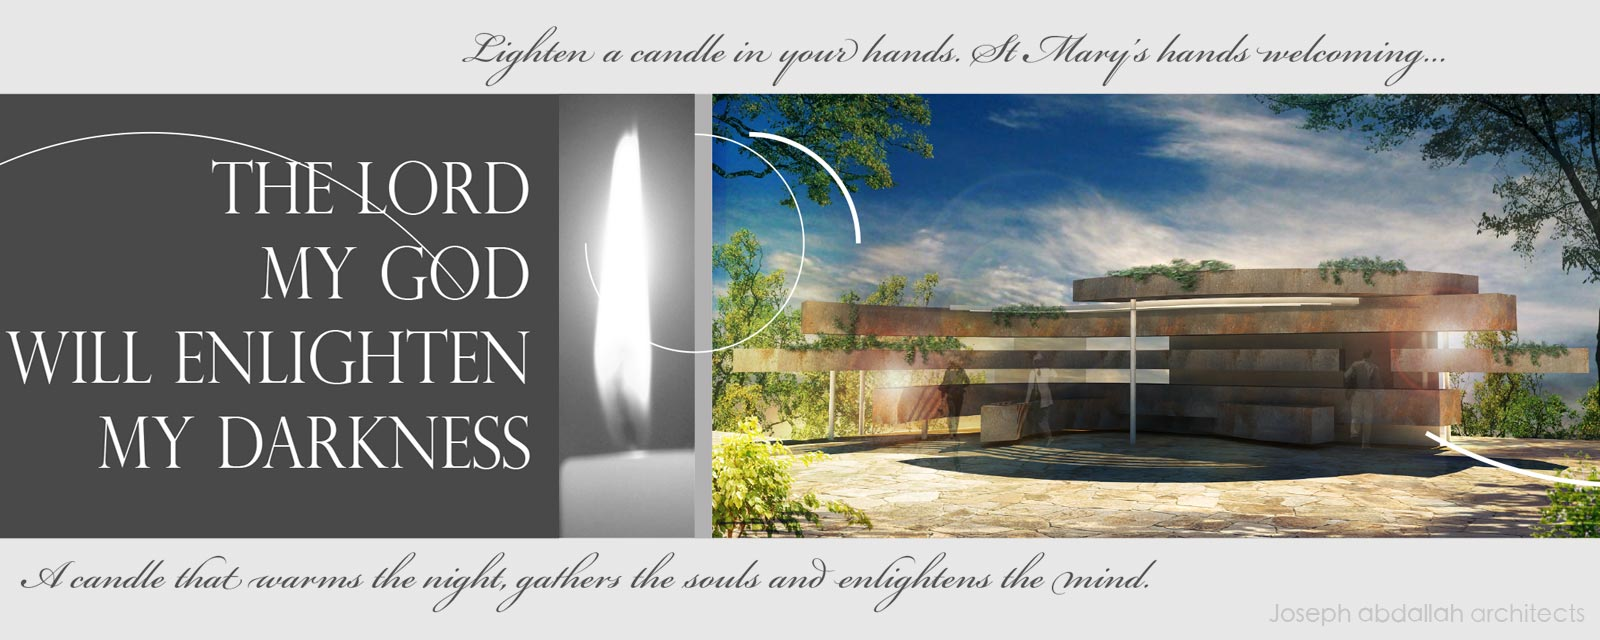 harissa-notre-dame-of-lebanon-shrink-architecture-joseph-abdallah-architects-4g